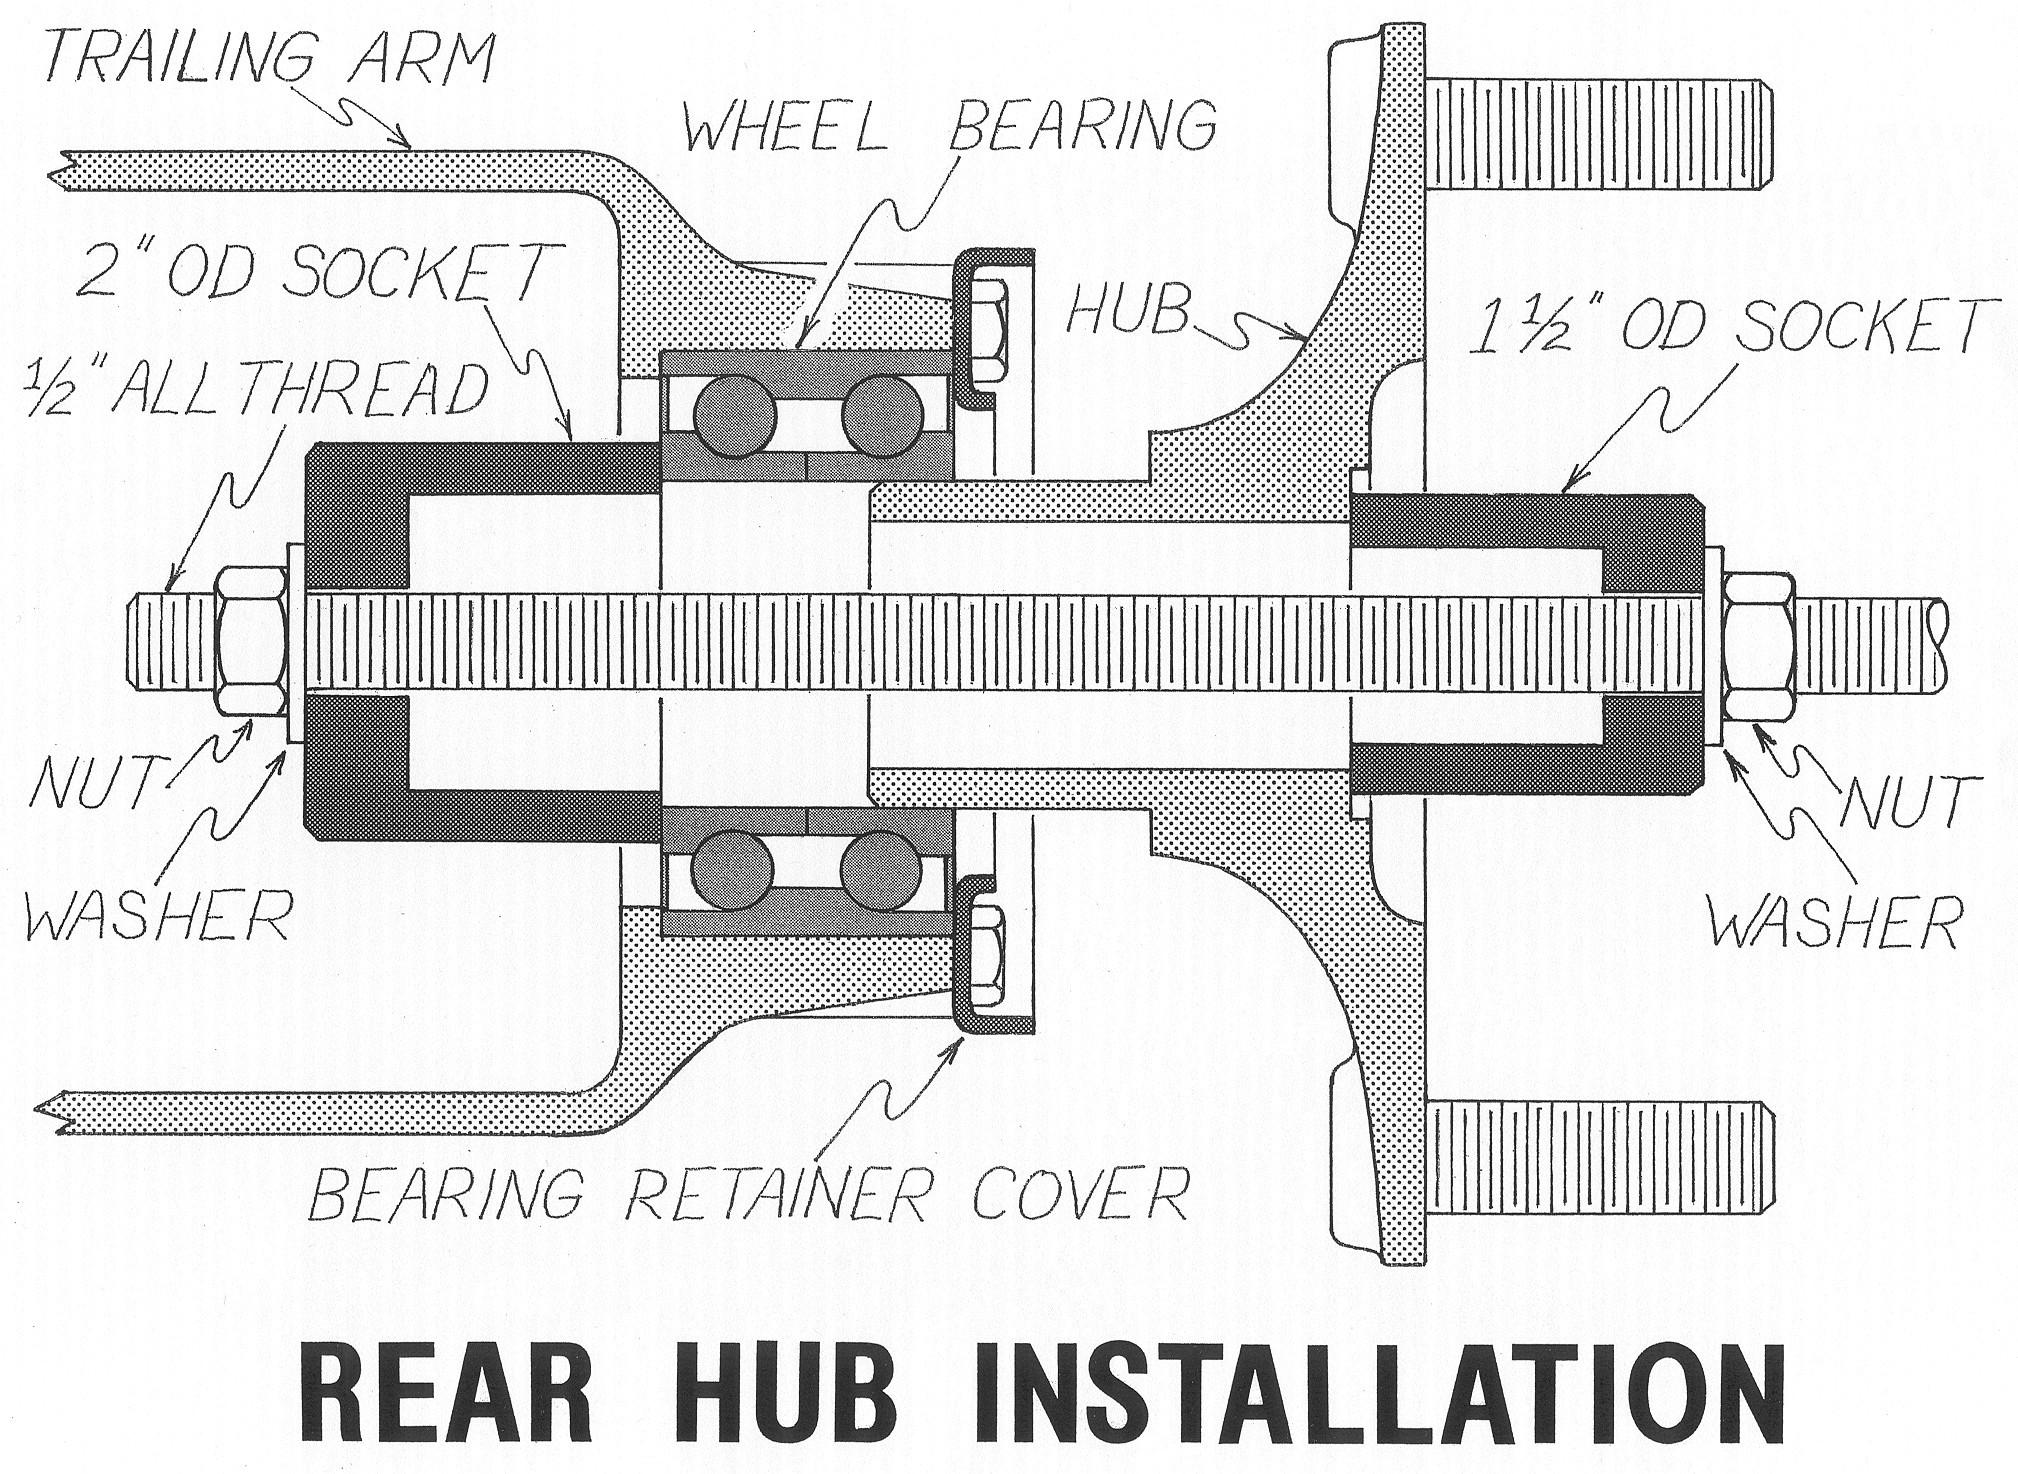 Wheel Bearing Assembly Diagram